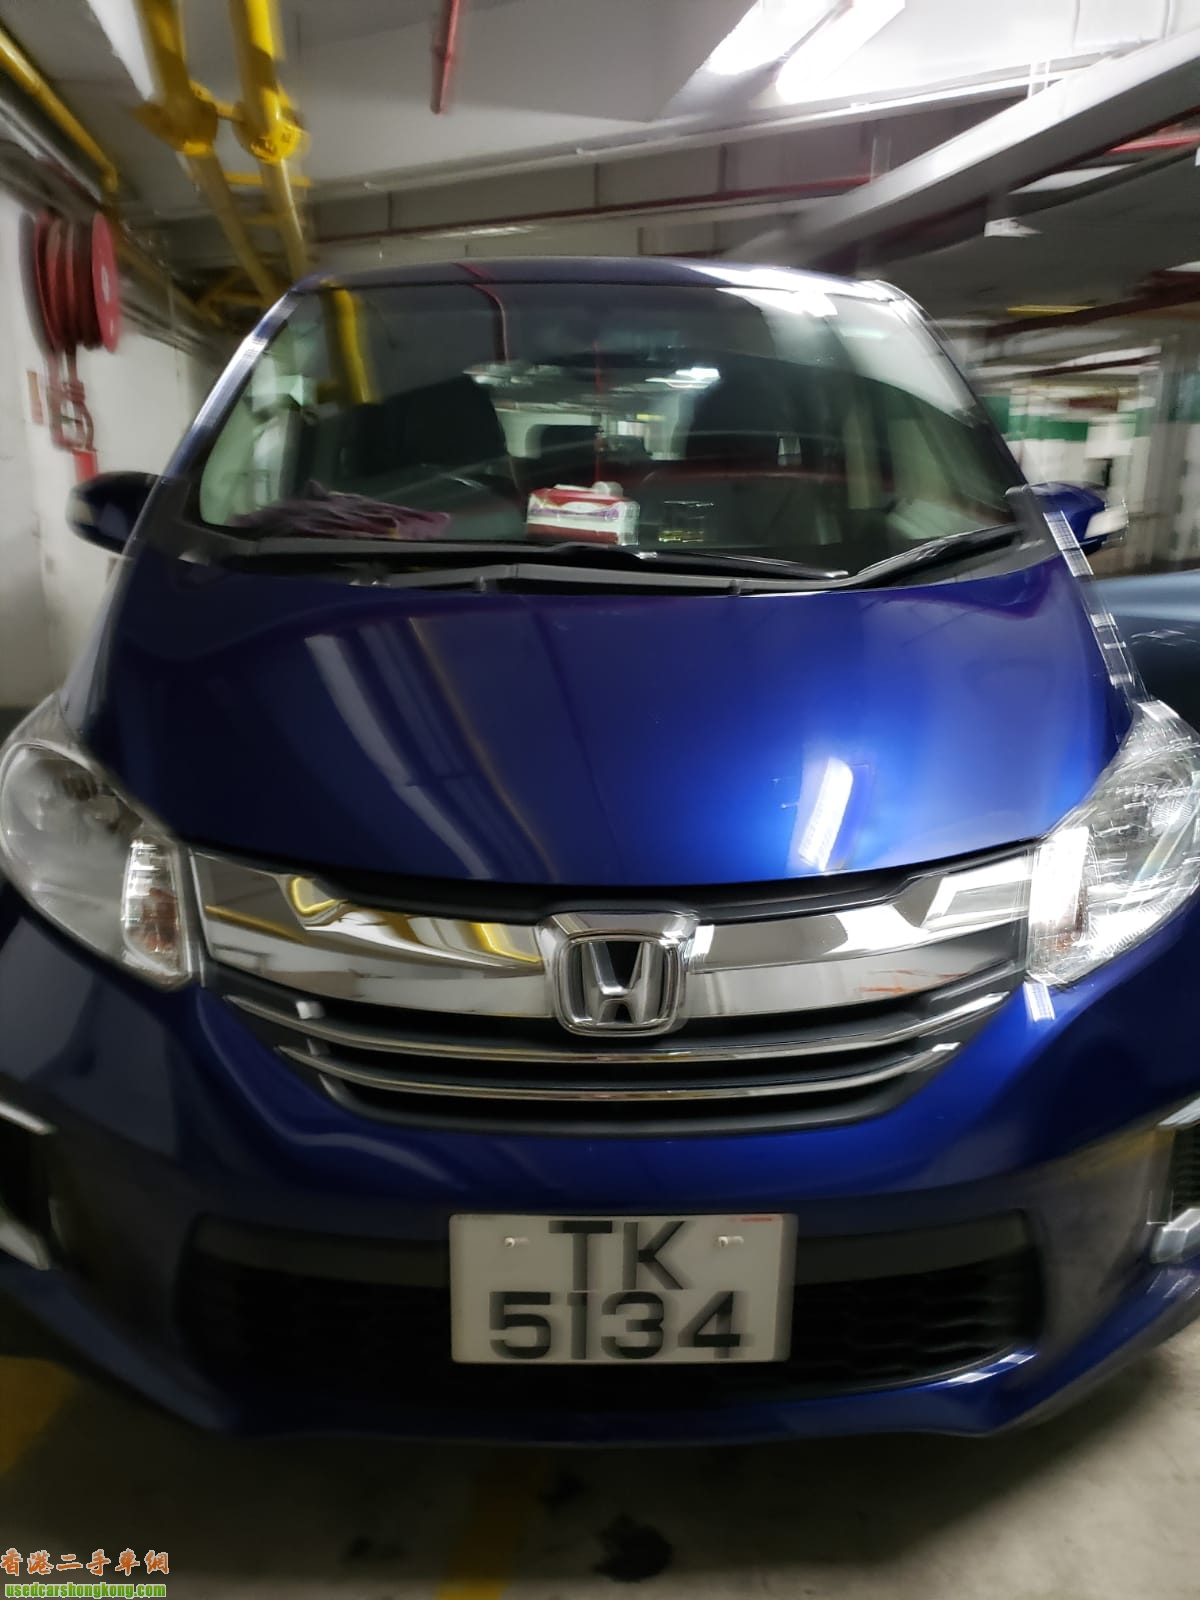 2015 Honda Freed G AERO 二手車出售 香港 Honda Freed 二手車易手車 - 香港二手車網